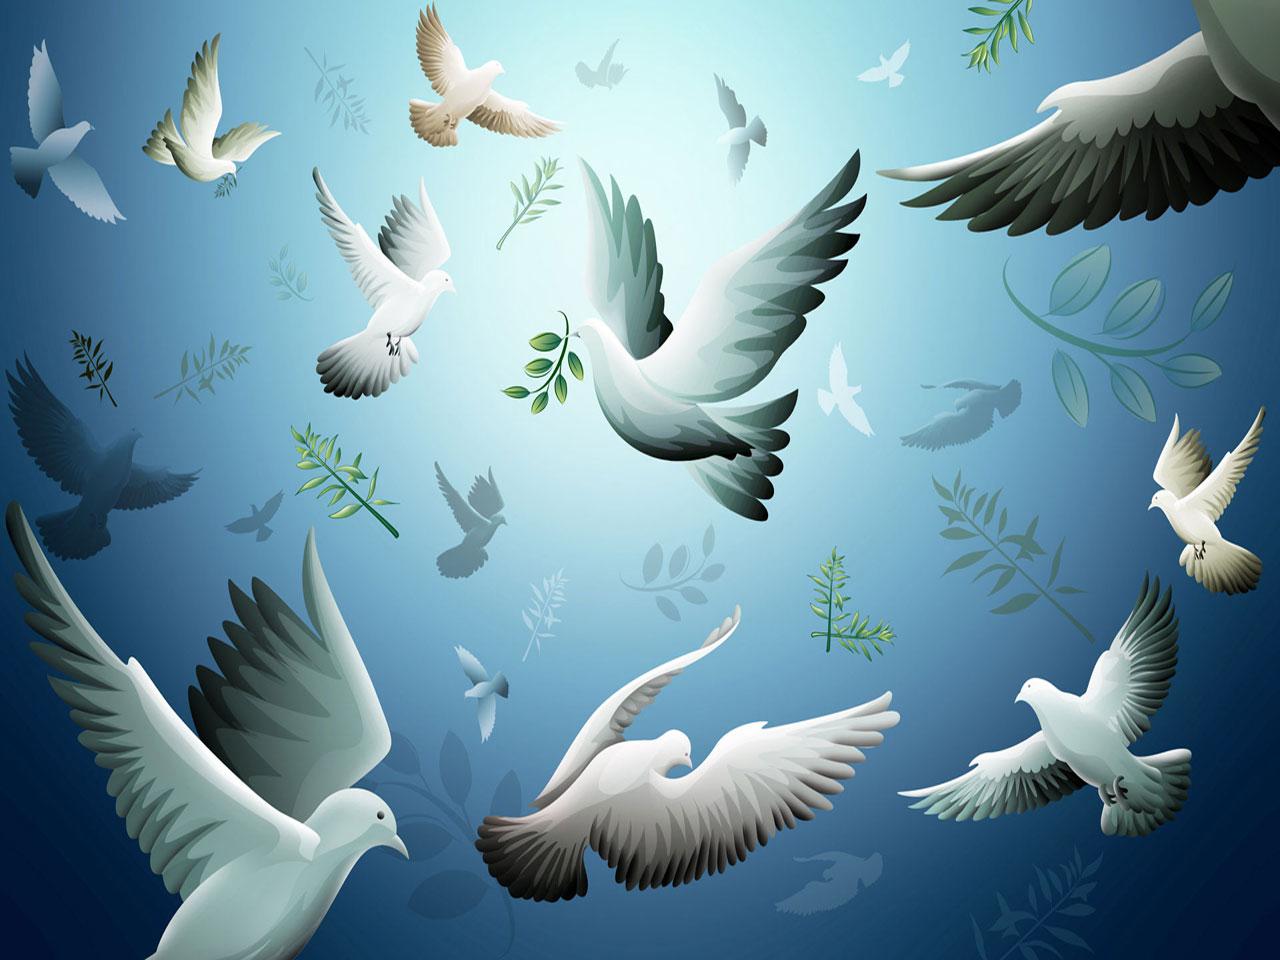 http://4.bp.blogspot.com/-4SQU3tNouwQ/UGLWmciseWI/AAAAAAAAFNk/fFK680rTlk0/s1600/animated-nature-wallpaper-animated-pigeons-wallpaper.jpg